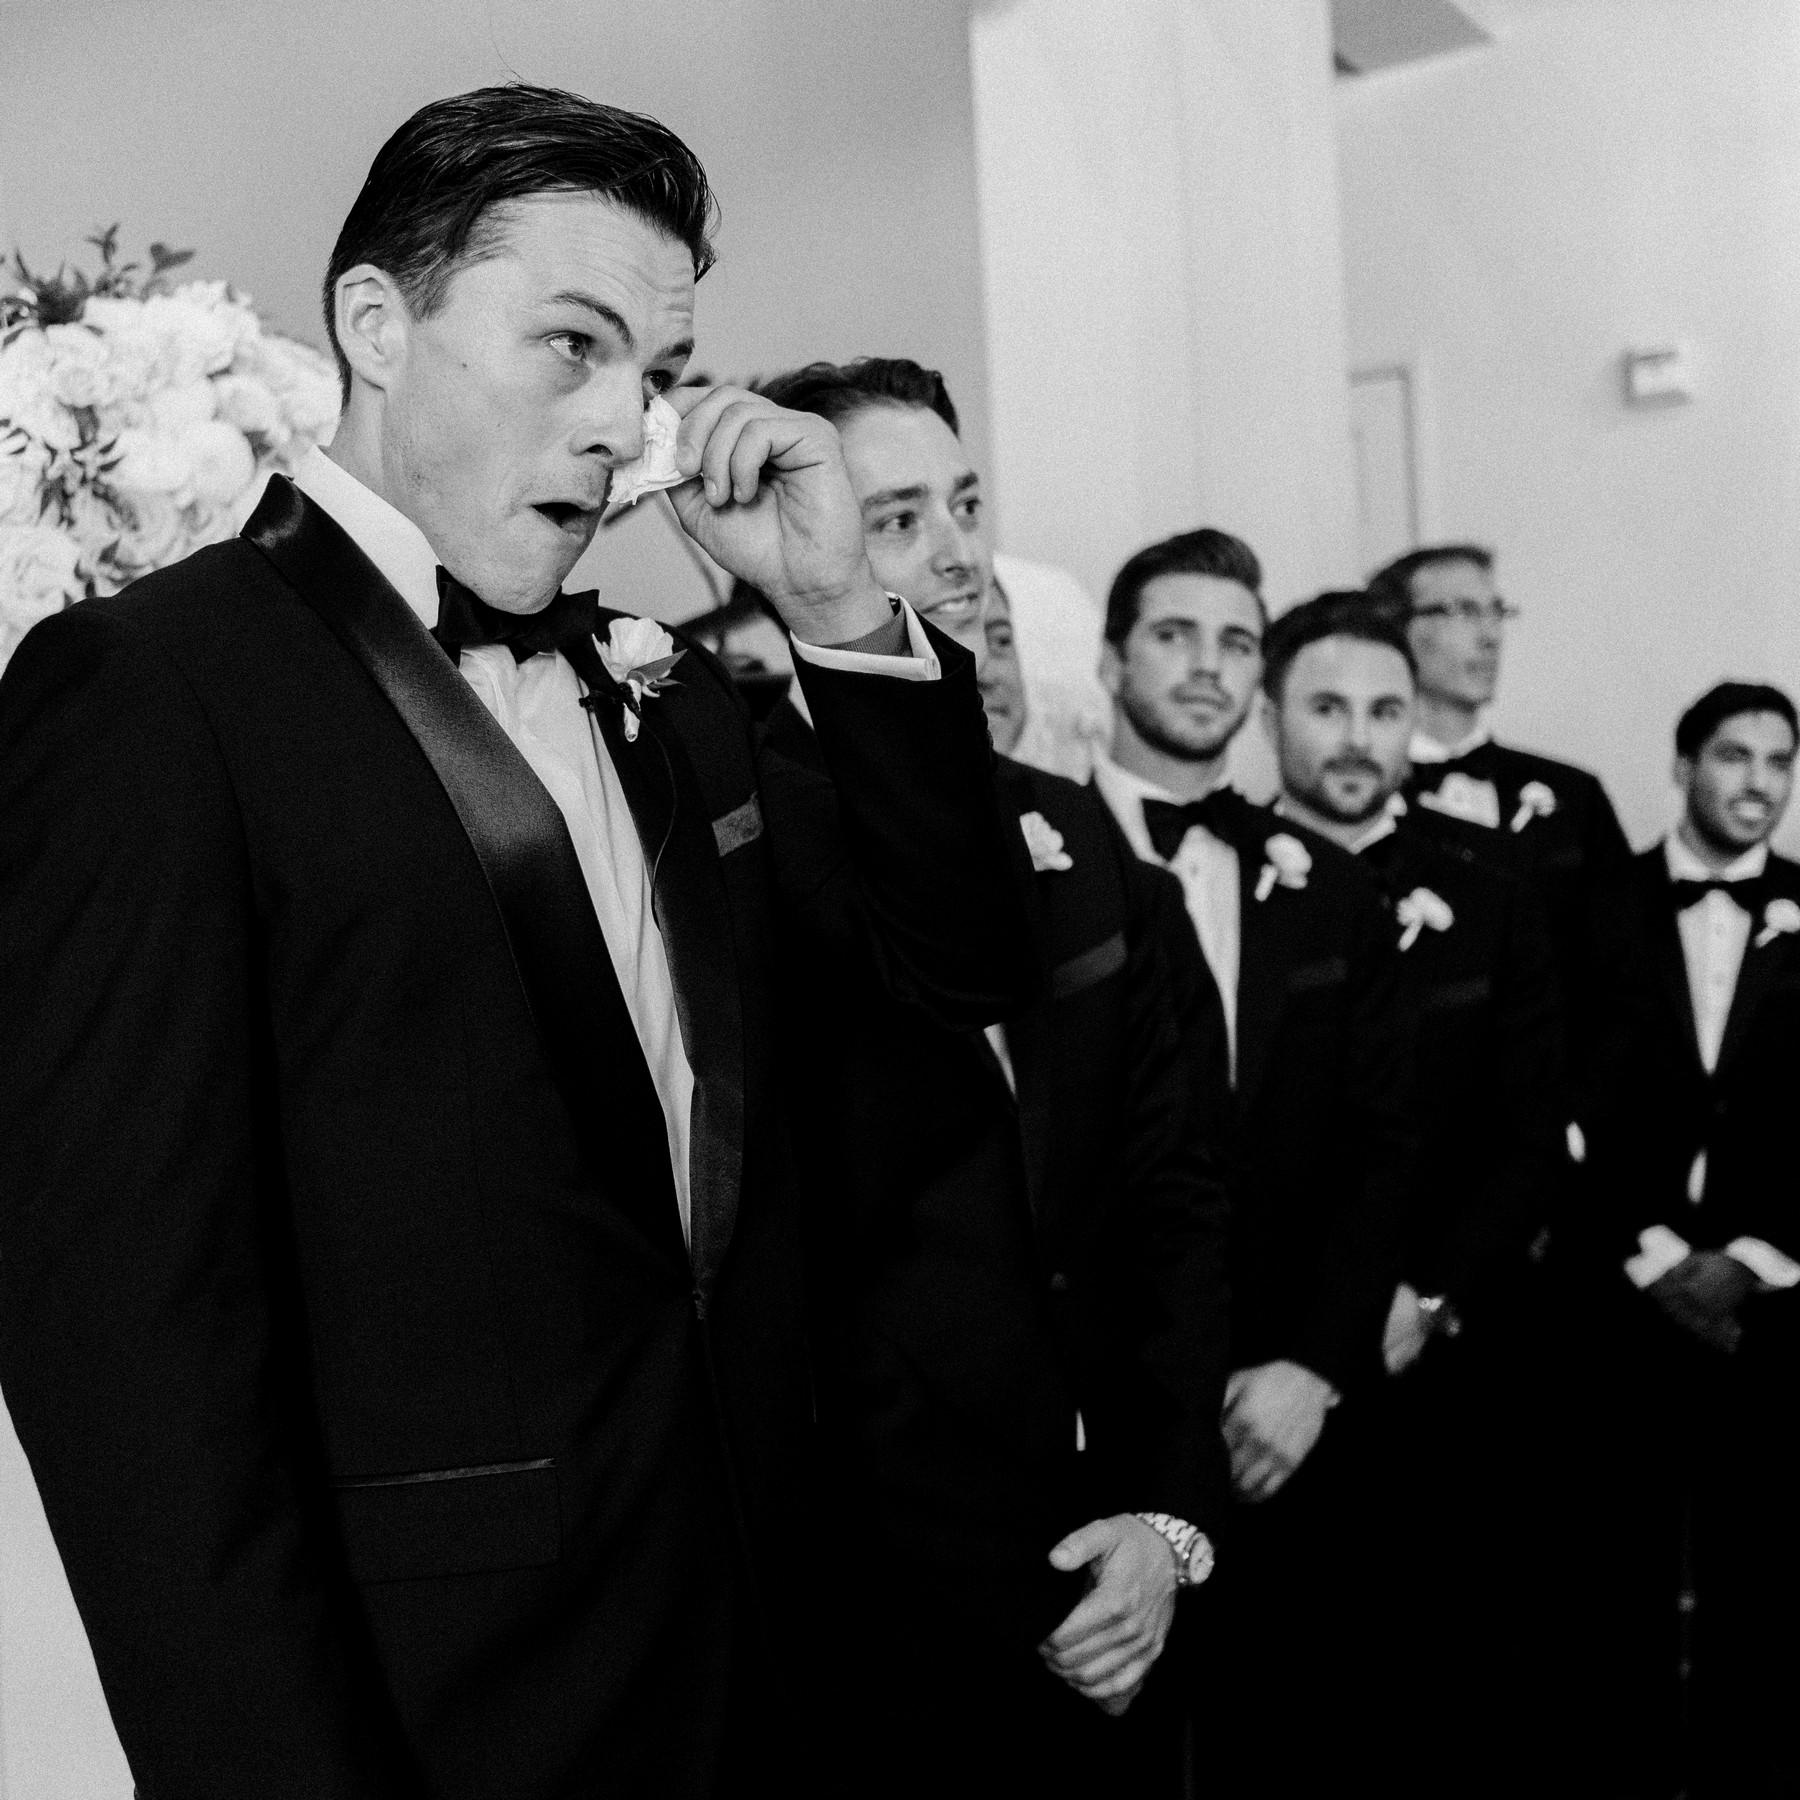 Leonardo Dicaprio wipes his eye during ceremony - photo by John and Joseph